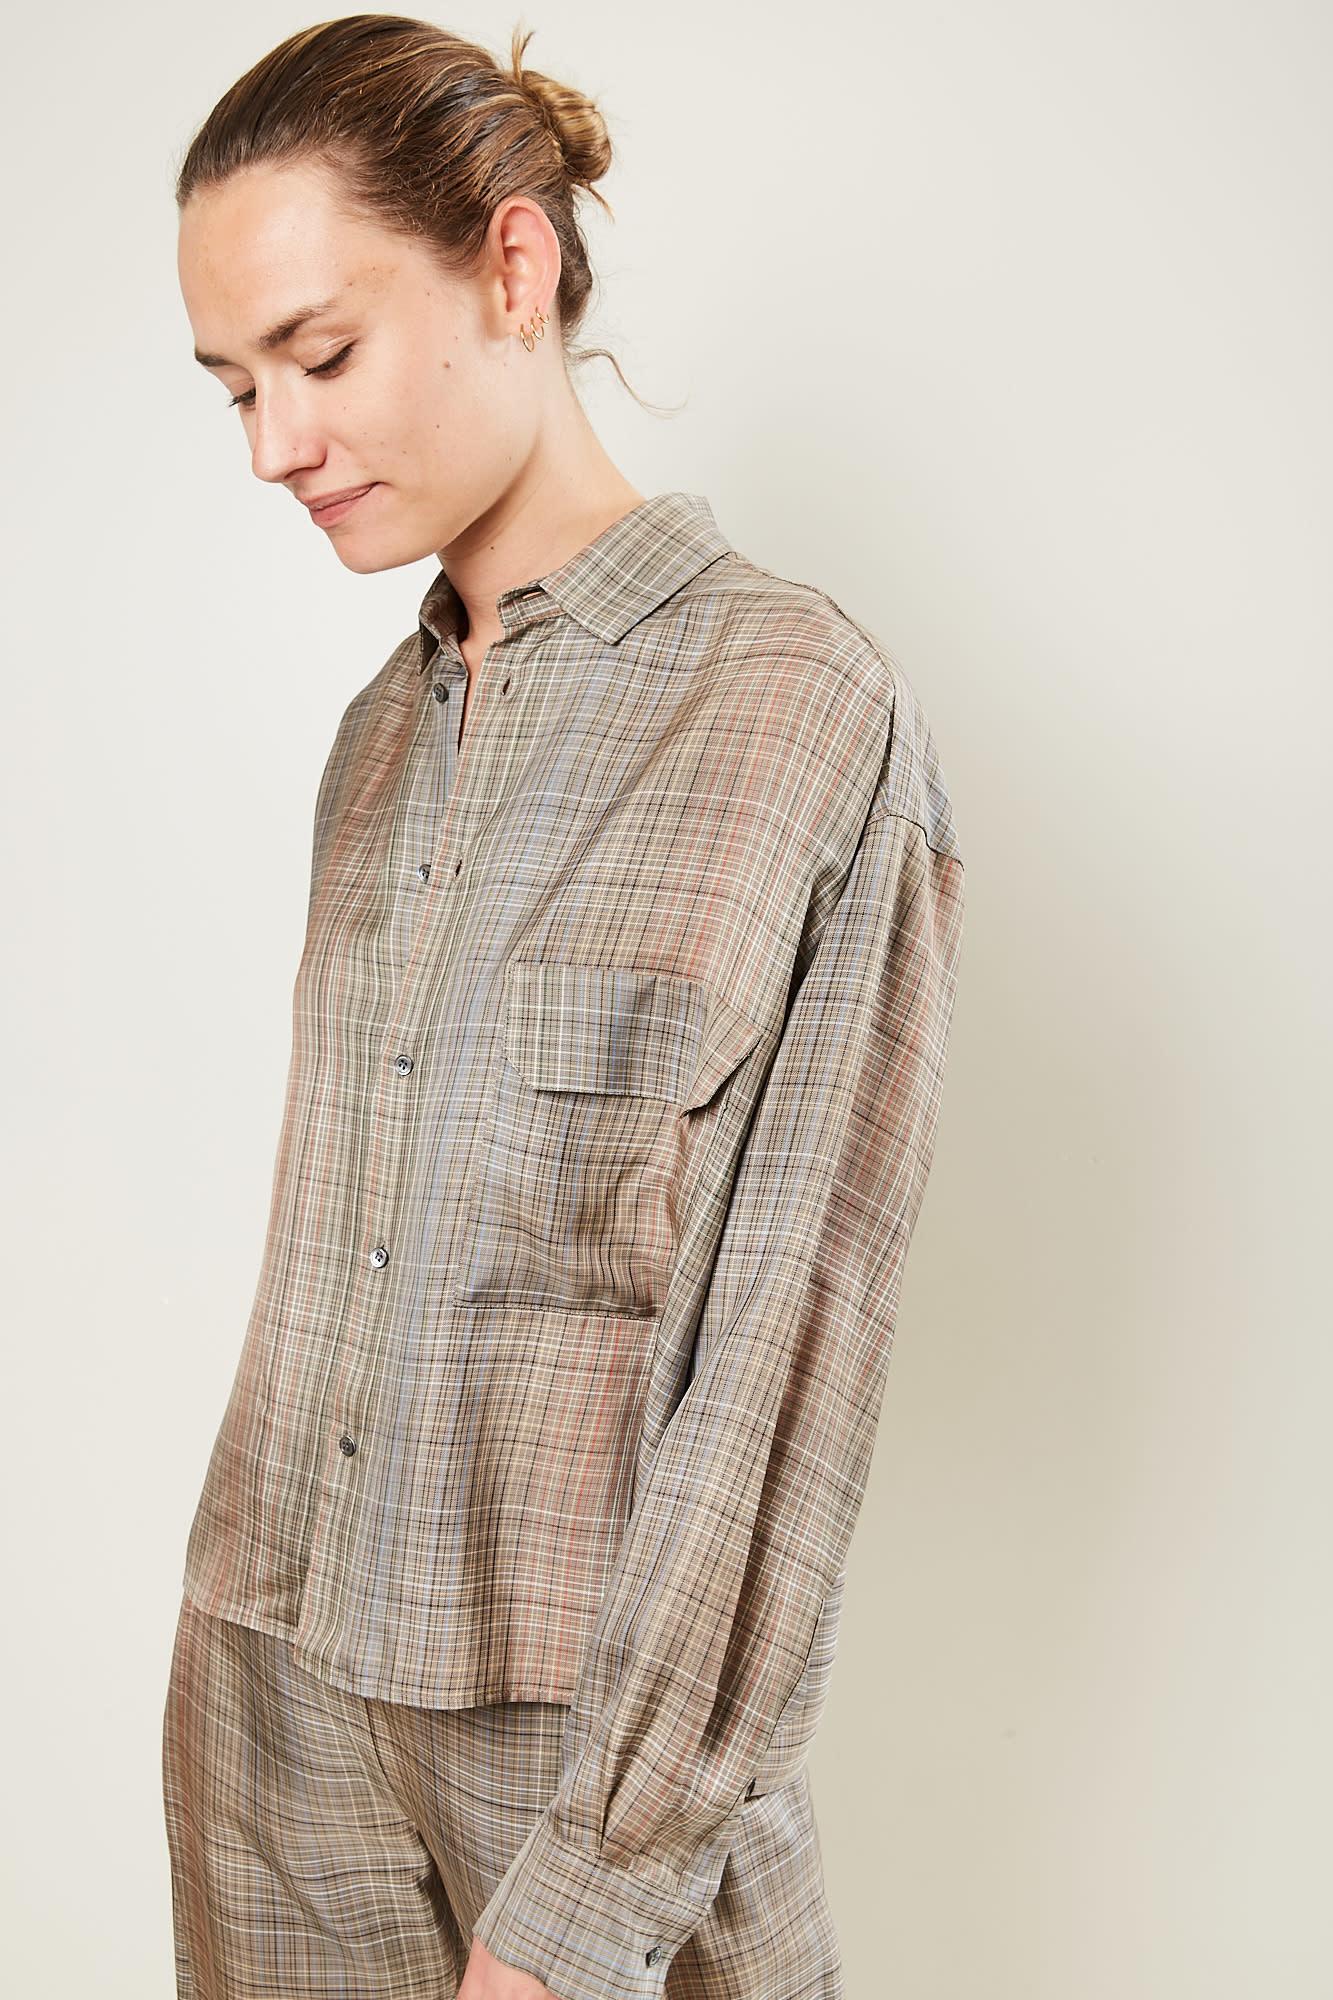 Stephan Schneider - Conifers shirt 49